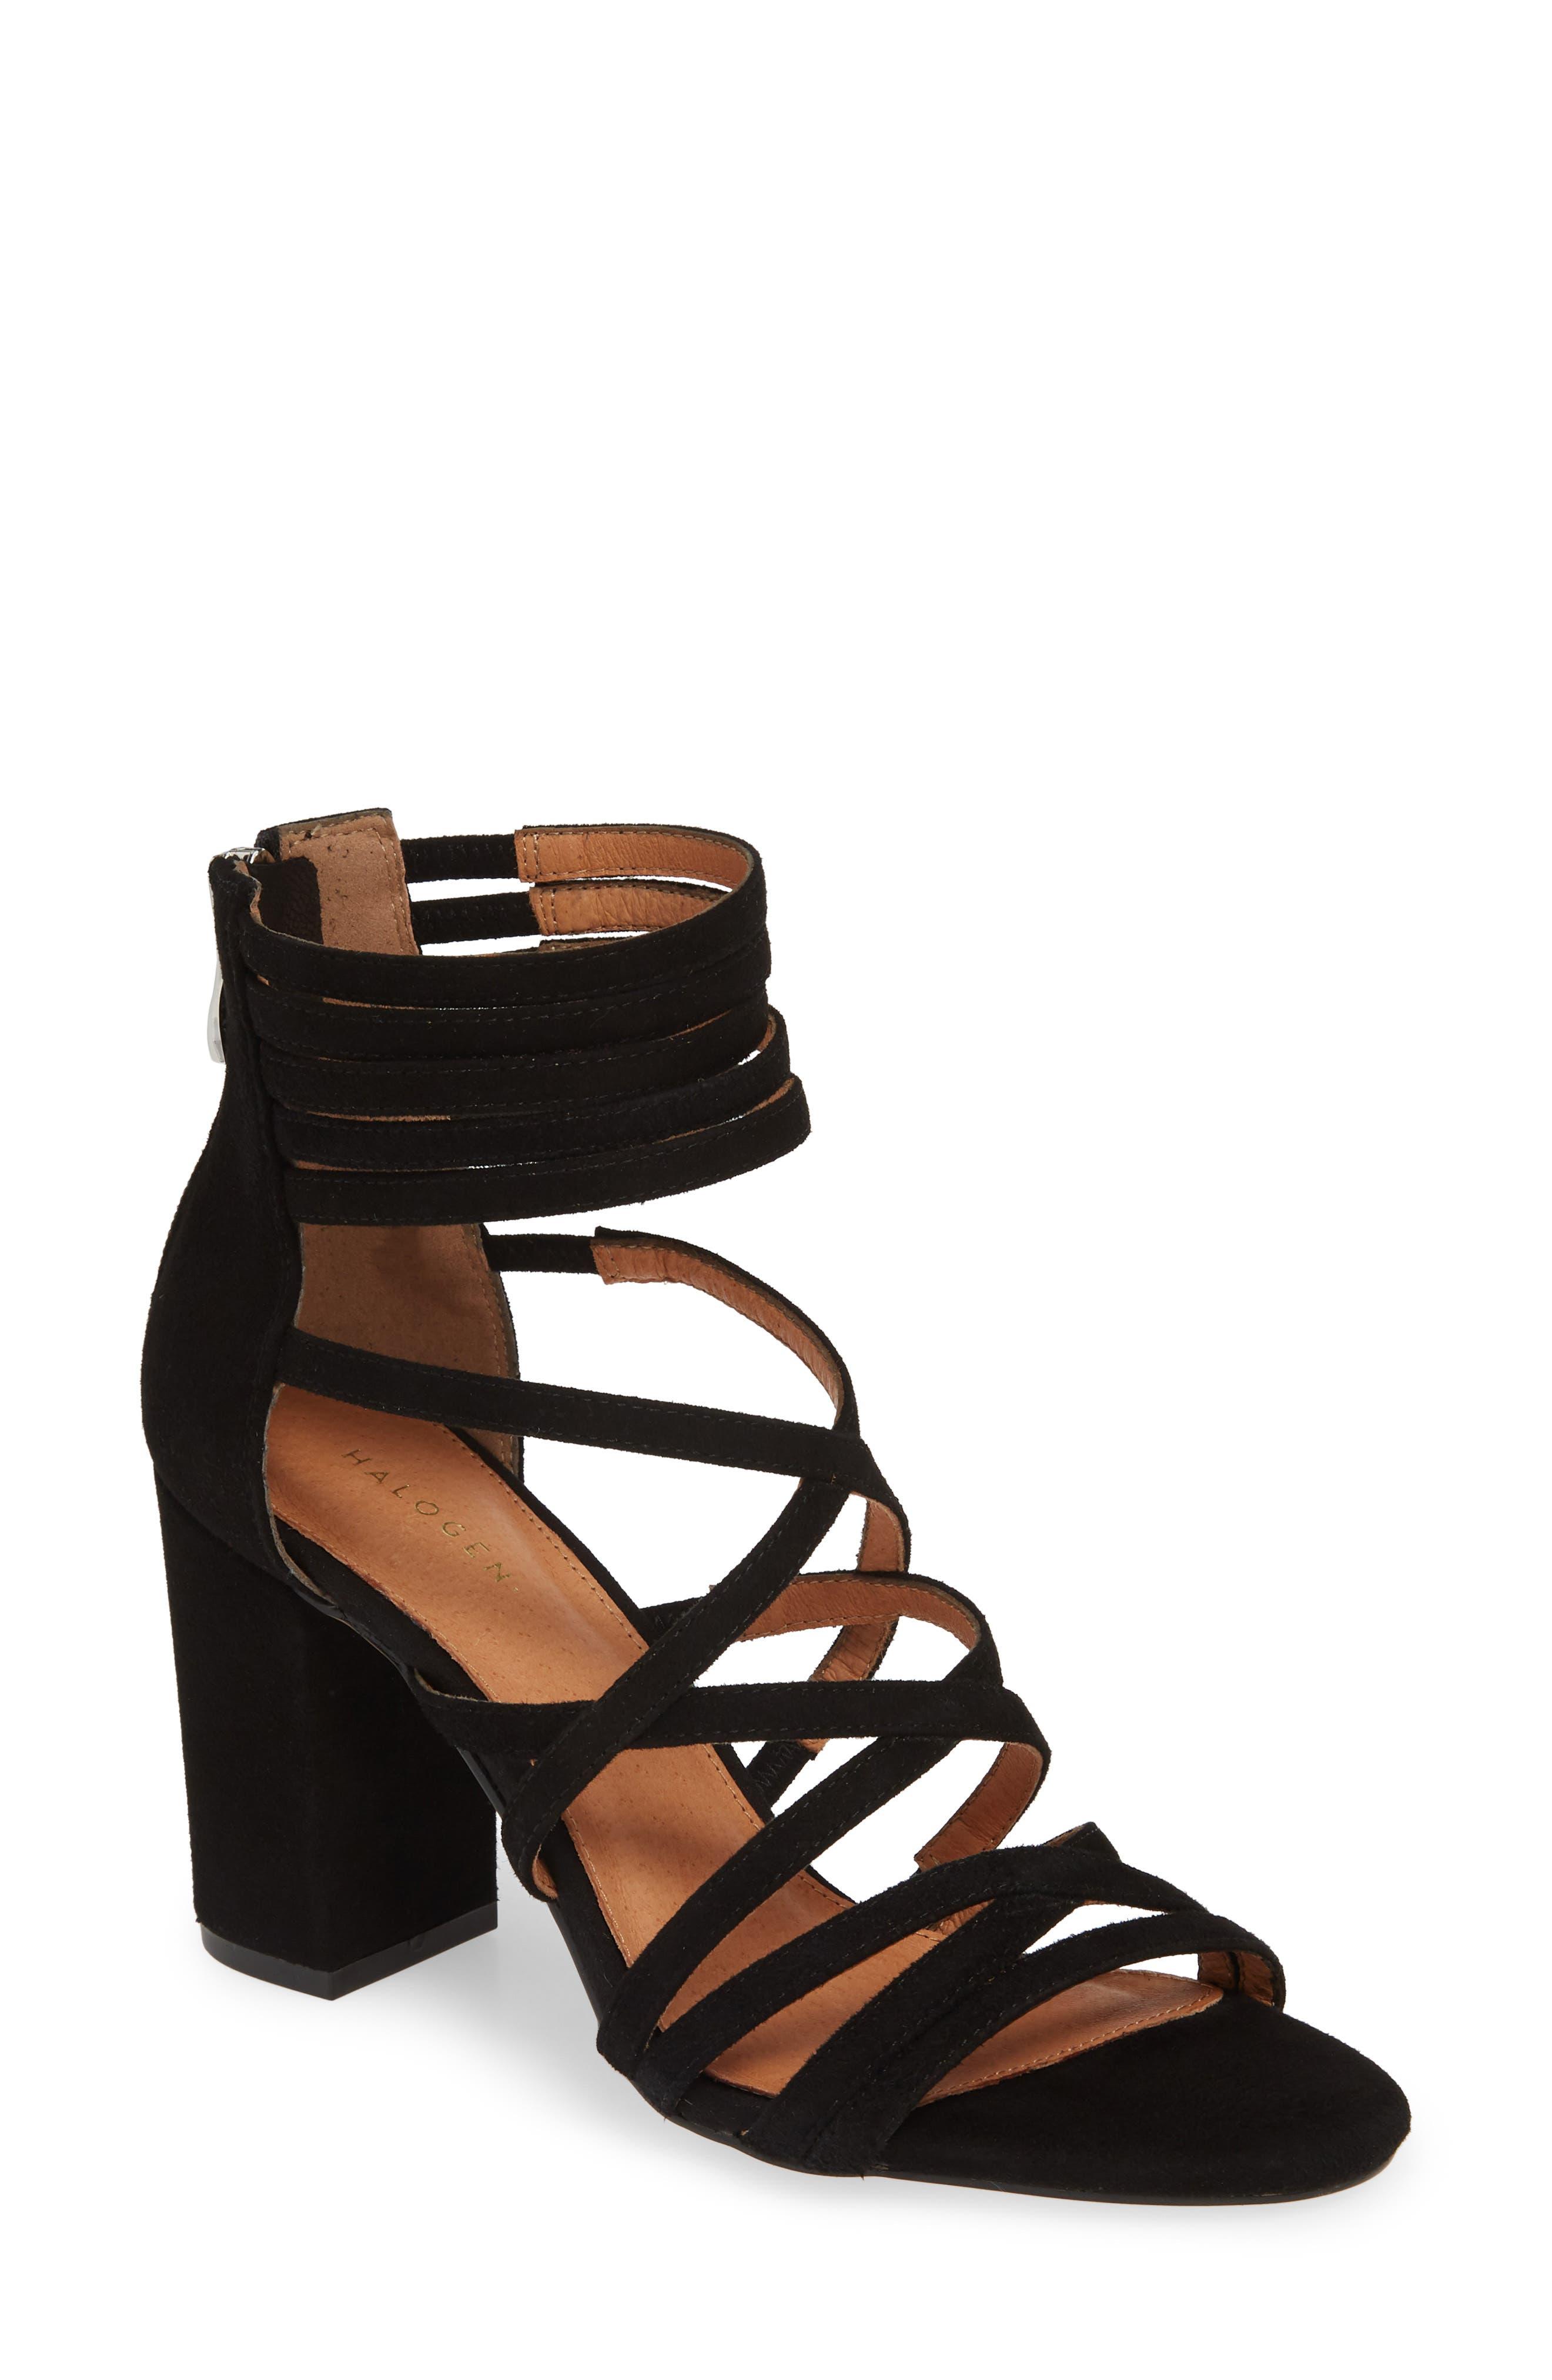 bba91801654 Women s Halogen® Sandals